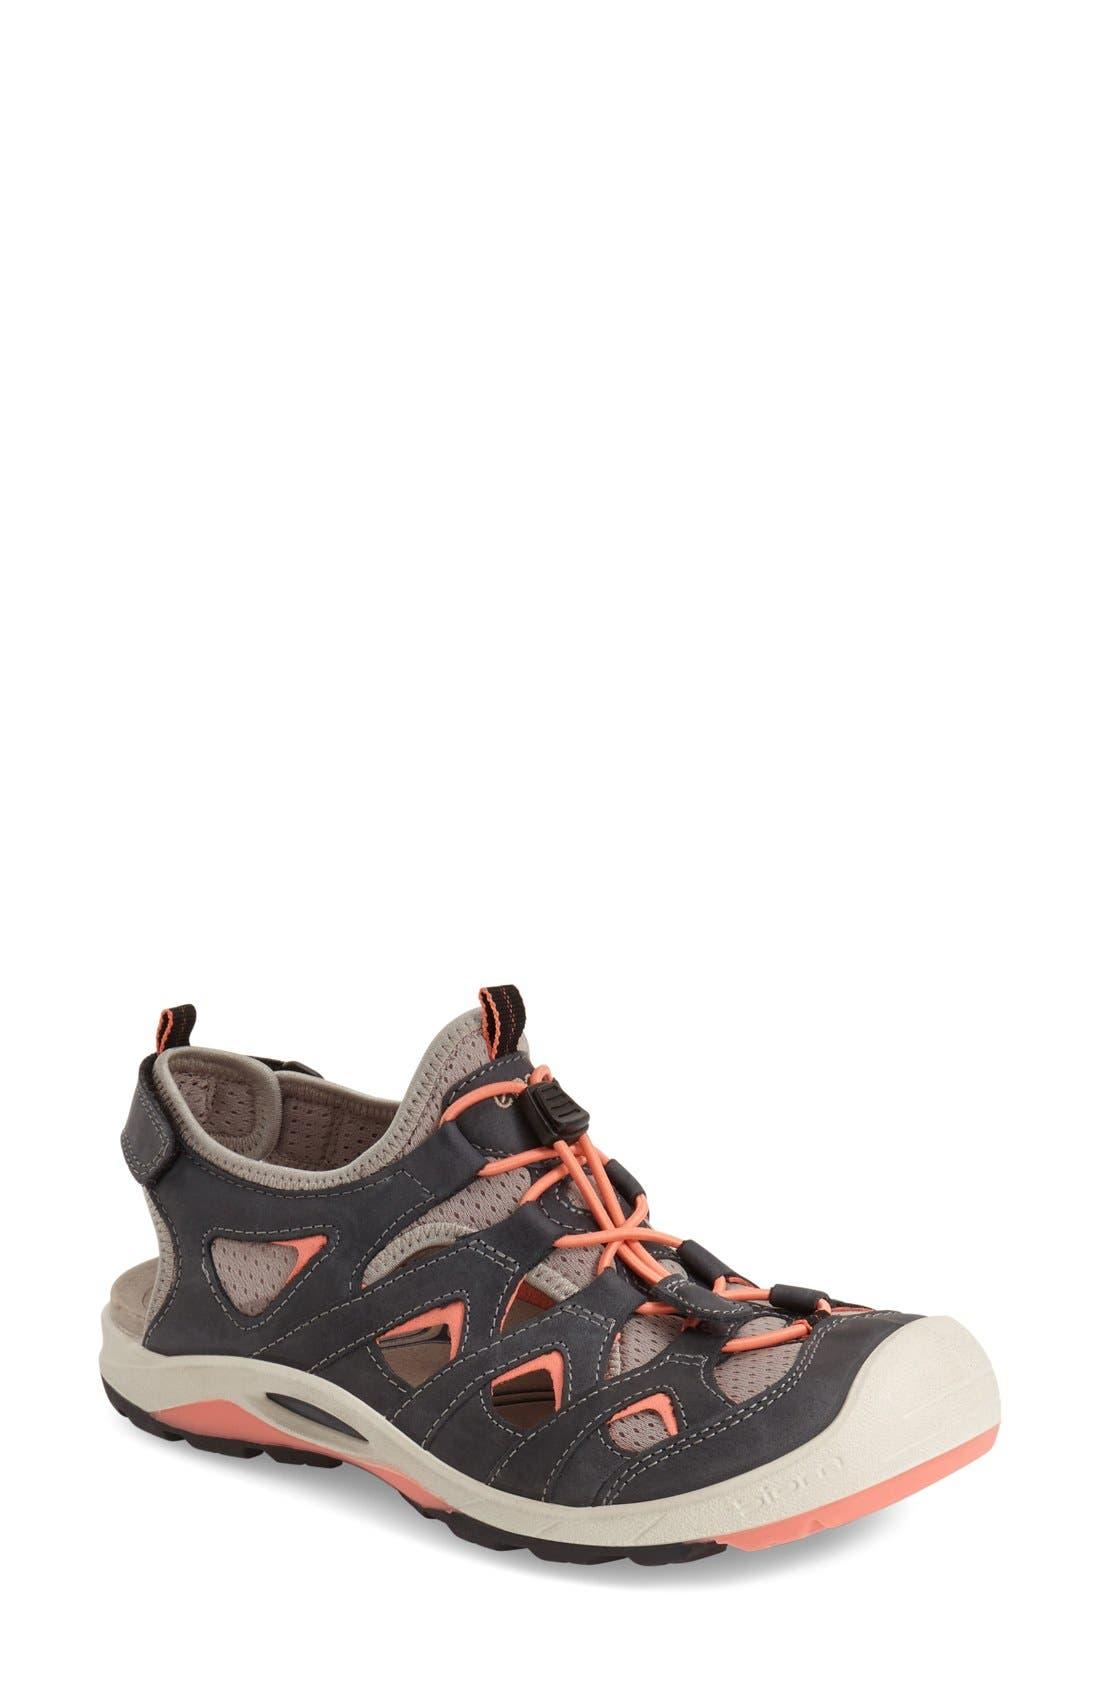 'Biom Delta Offroad' Sneaker,                             Main thumbnail 1, color,                             400